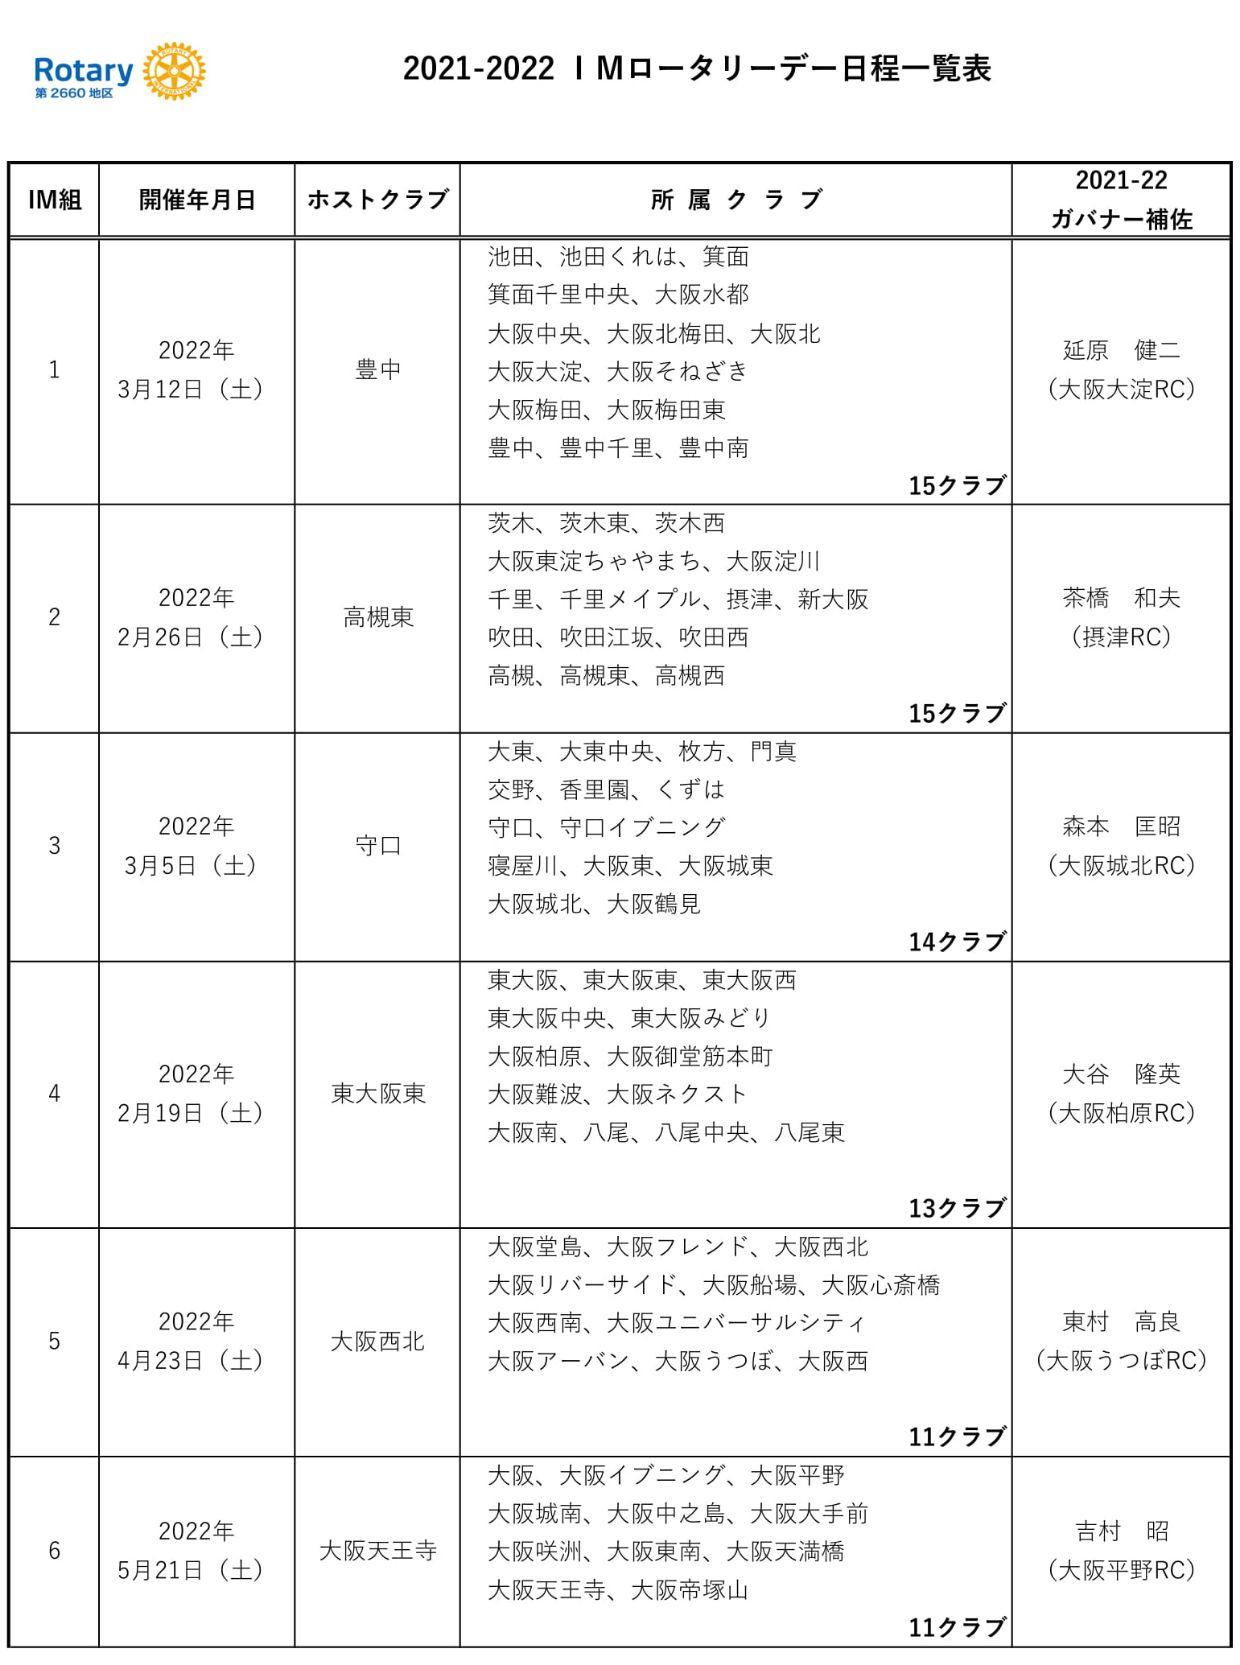 2021-22 IMロータリーデー日程表